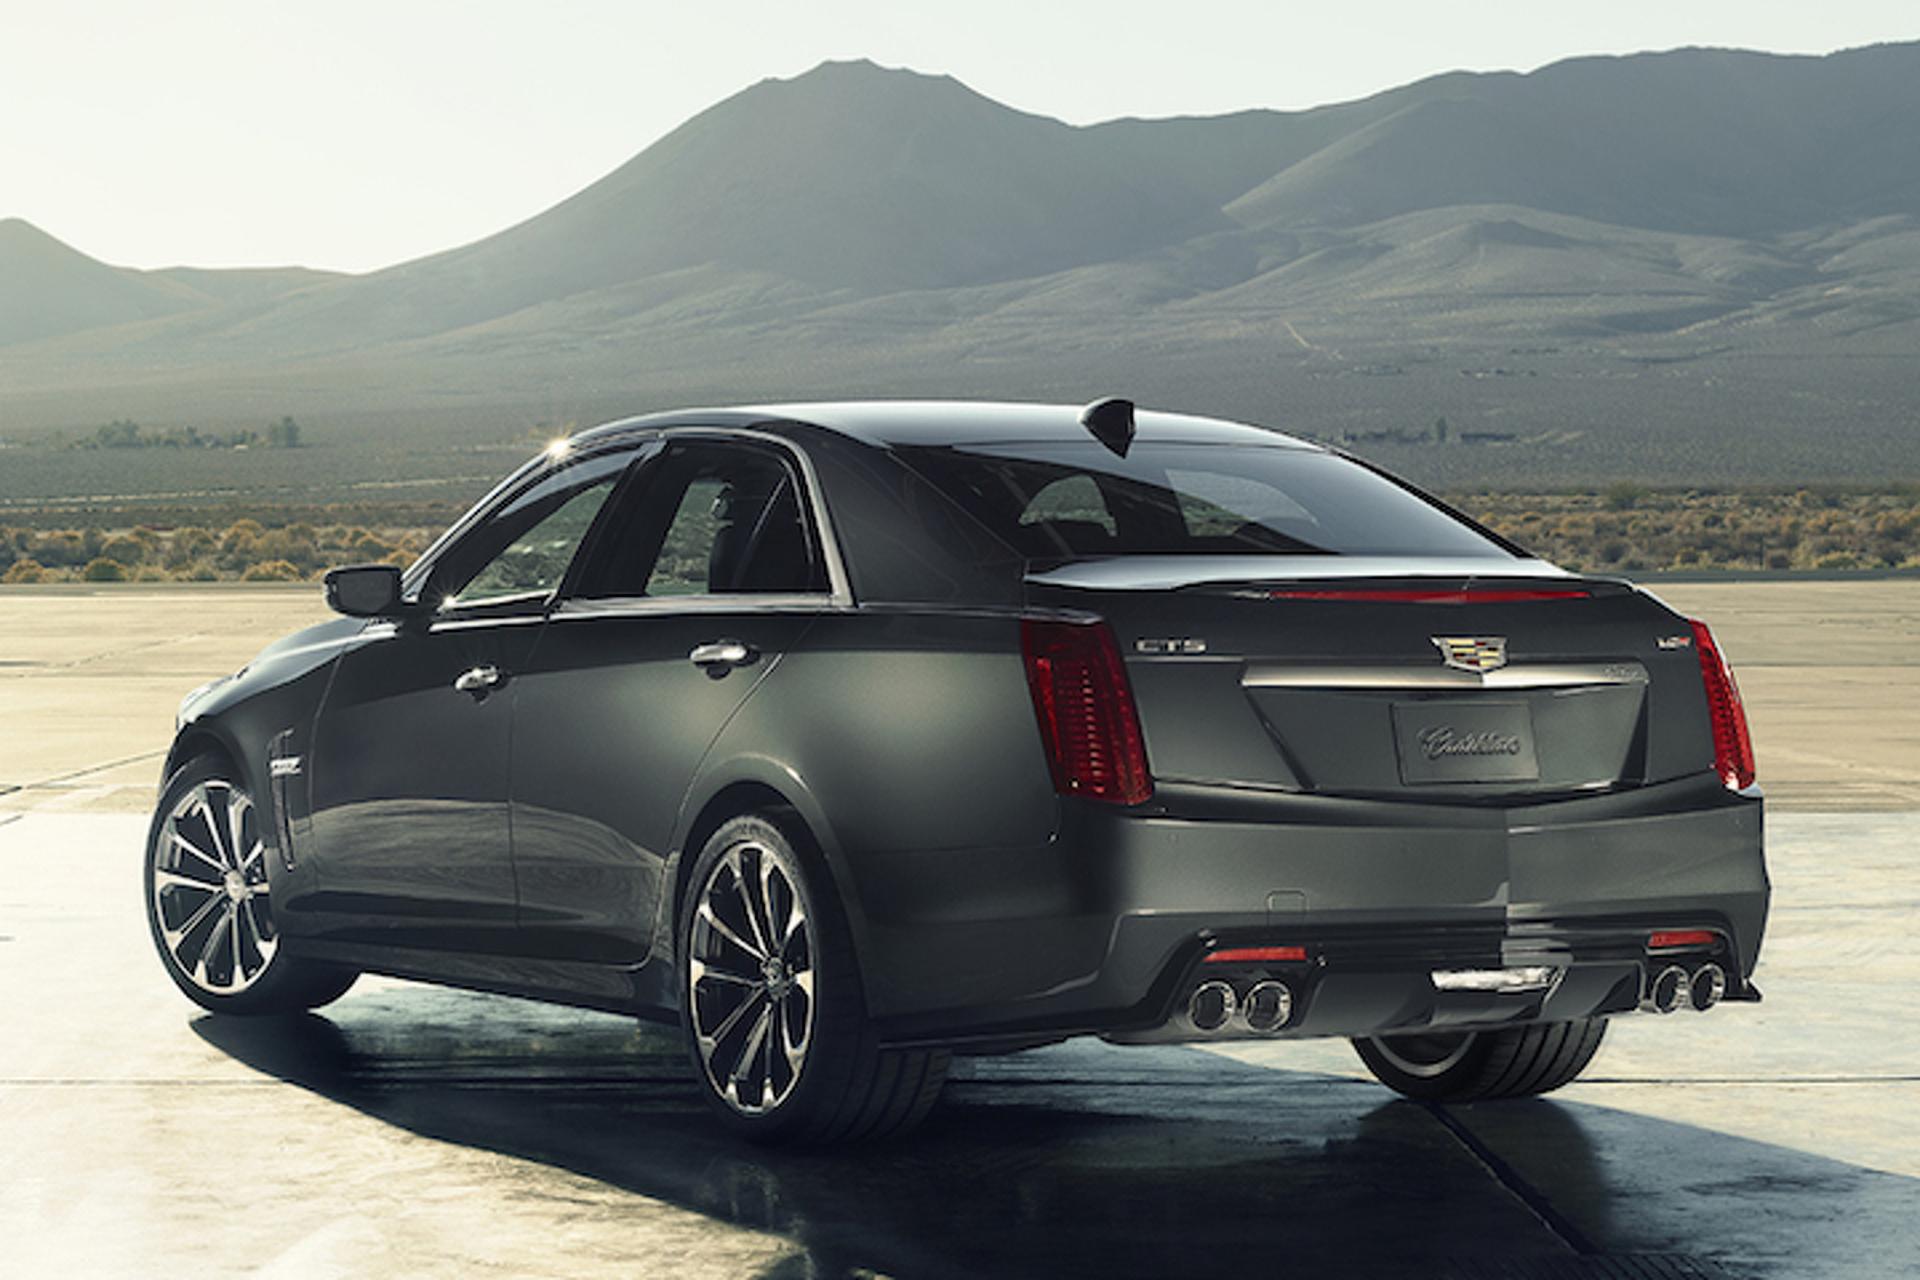 Cadillac Contemplating Hybrid All-Wheel Drive